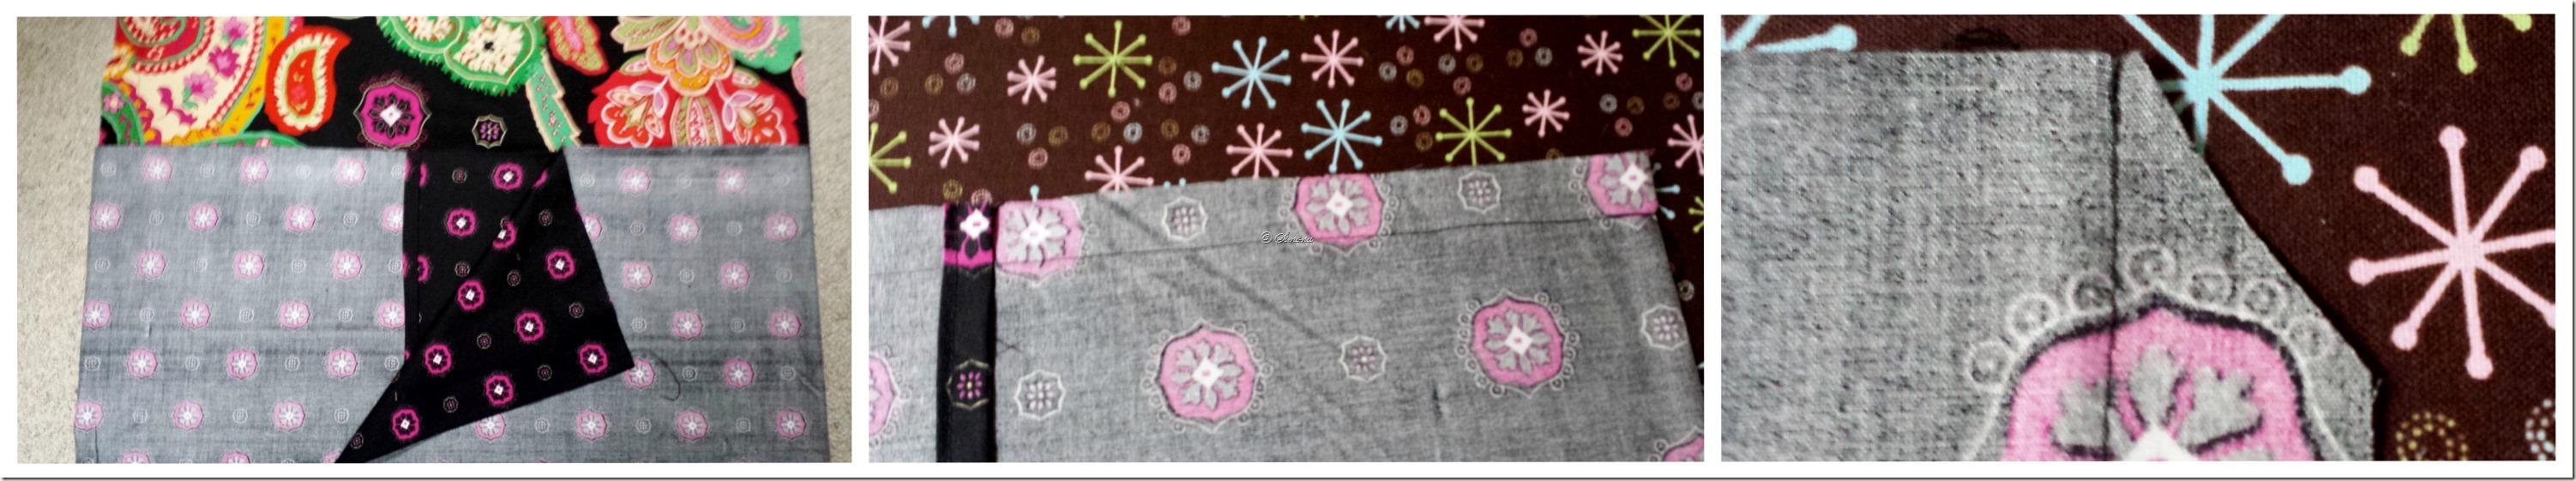 pillowcase corners